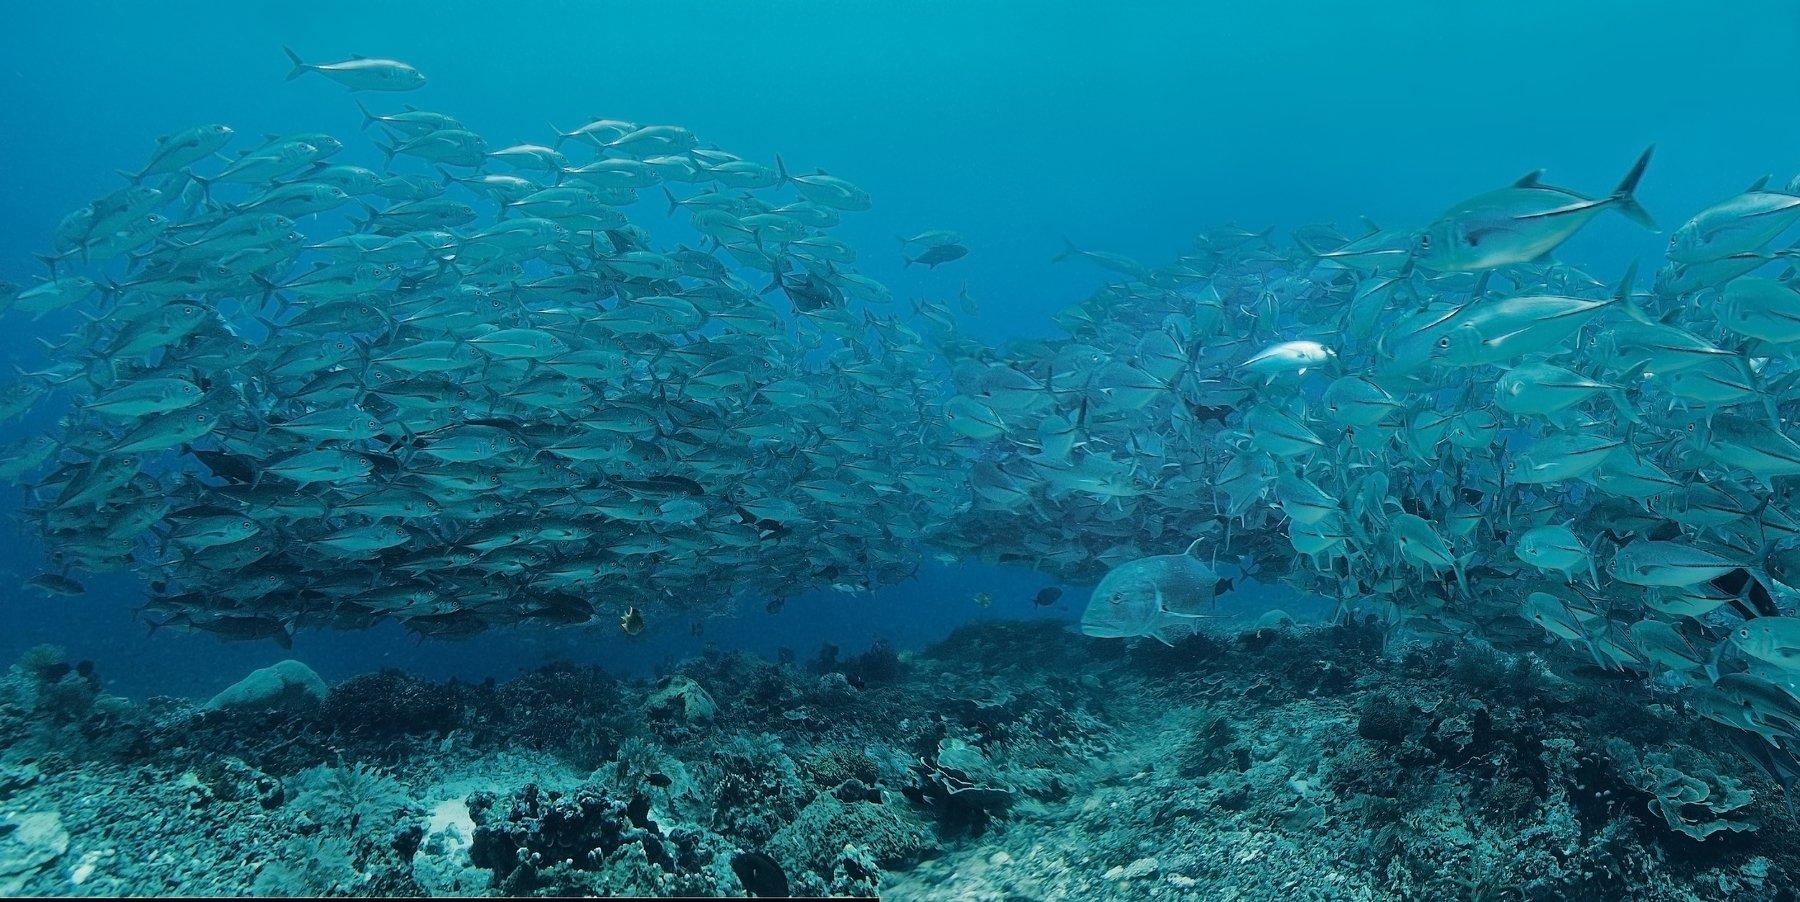 дайвинг, рыба, индонезия, стая, океан, Дмитрий